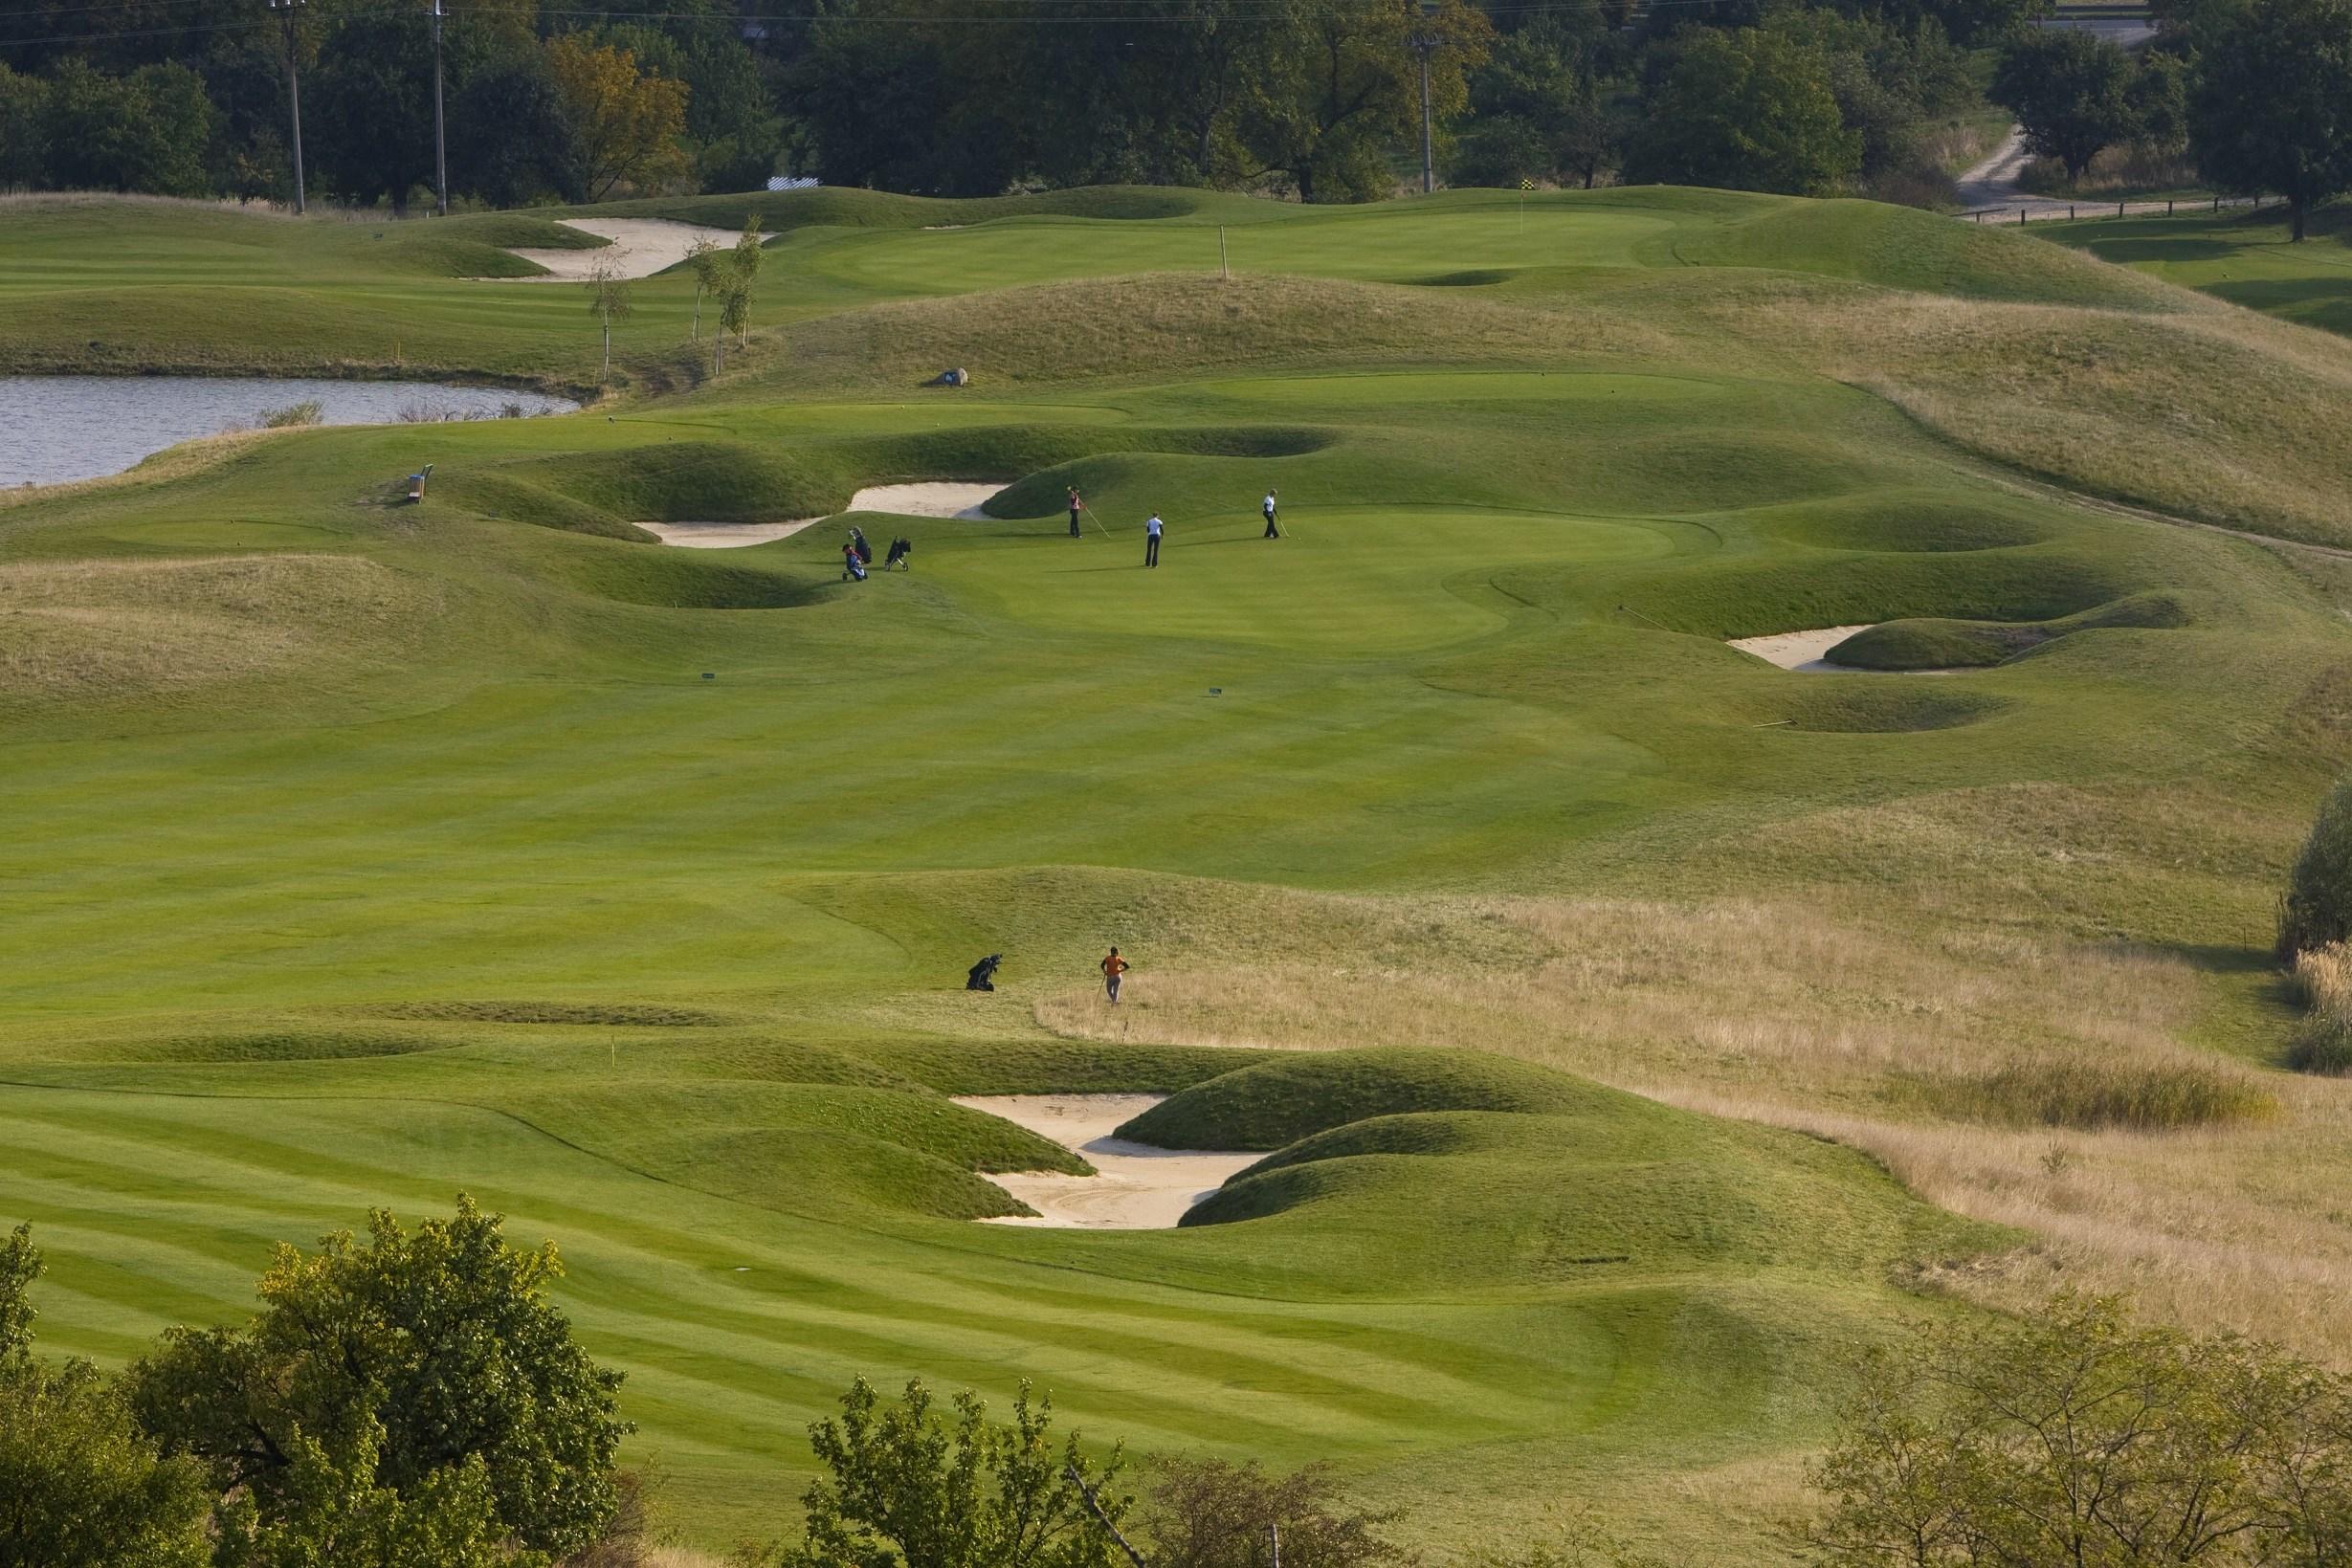 Golf_Austerlitz_02.jpg